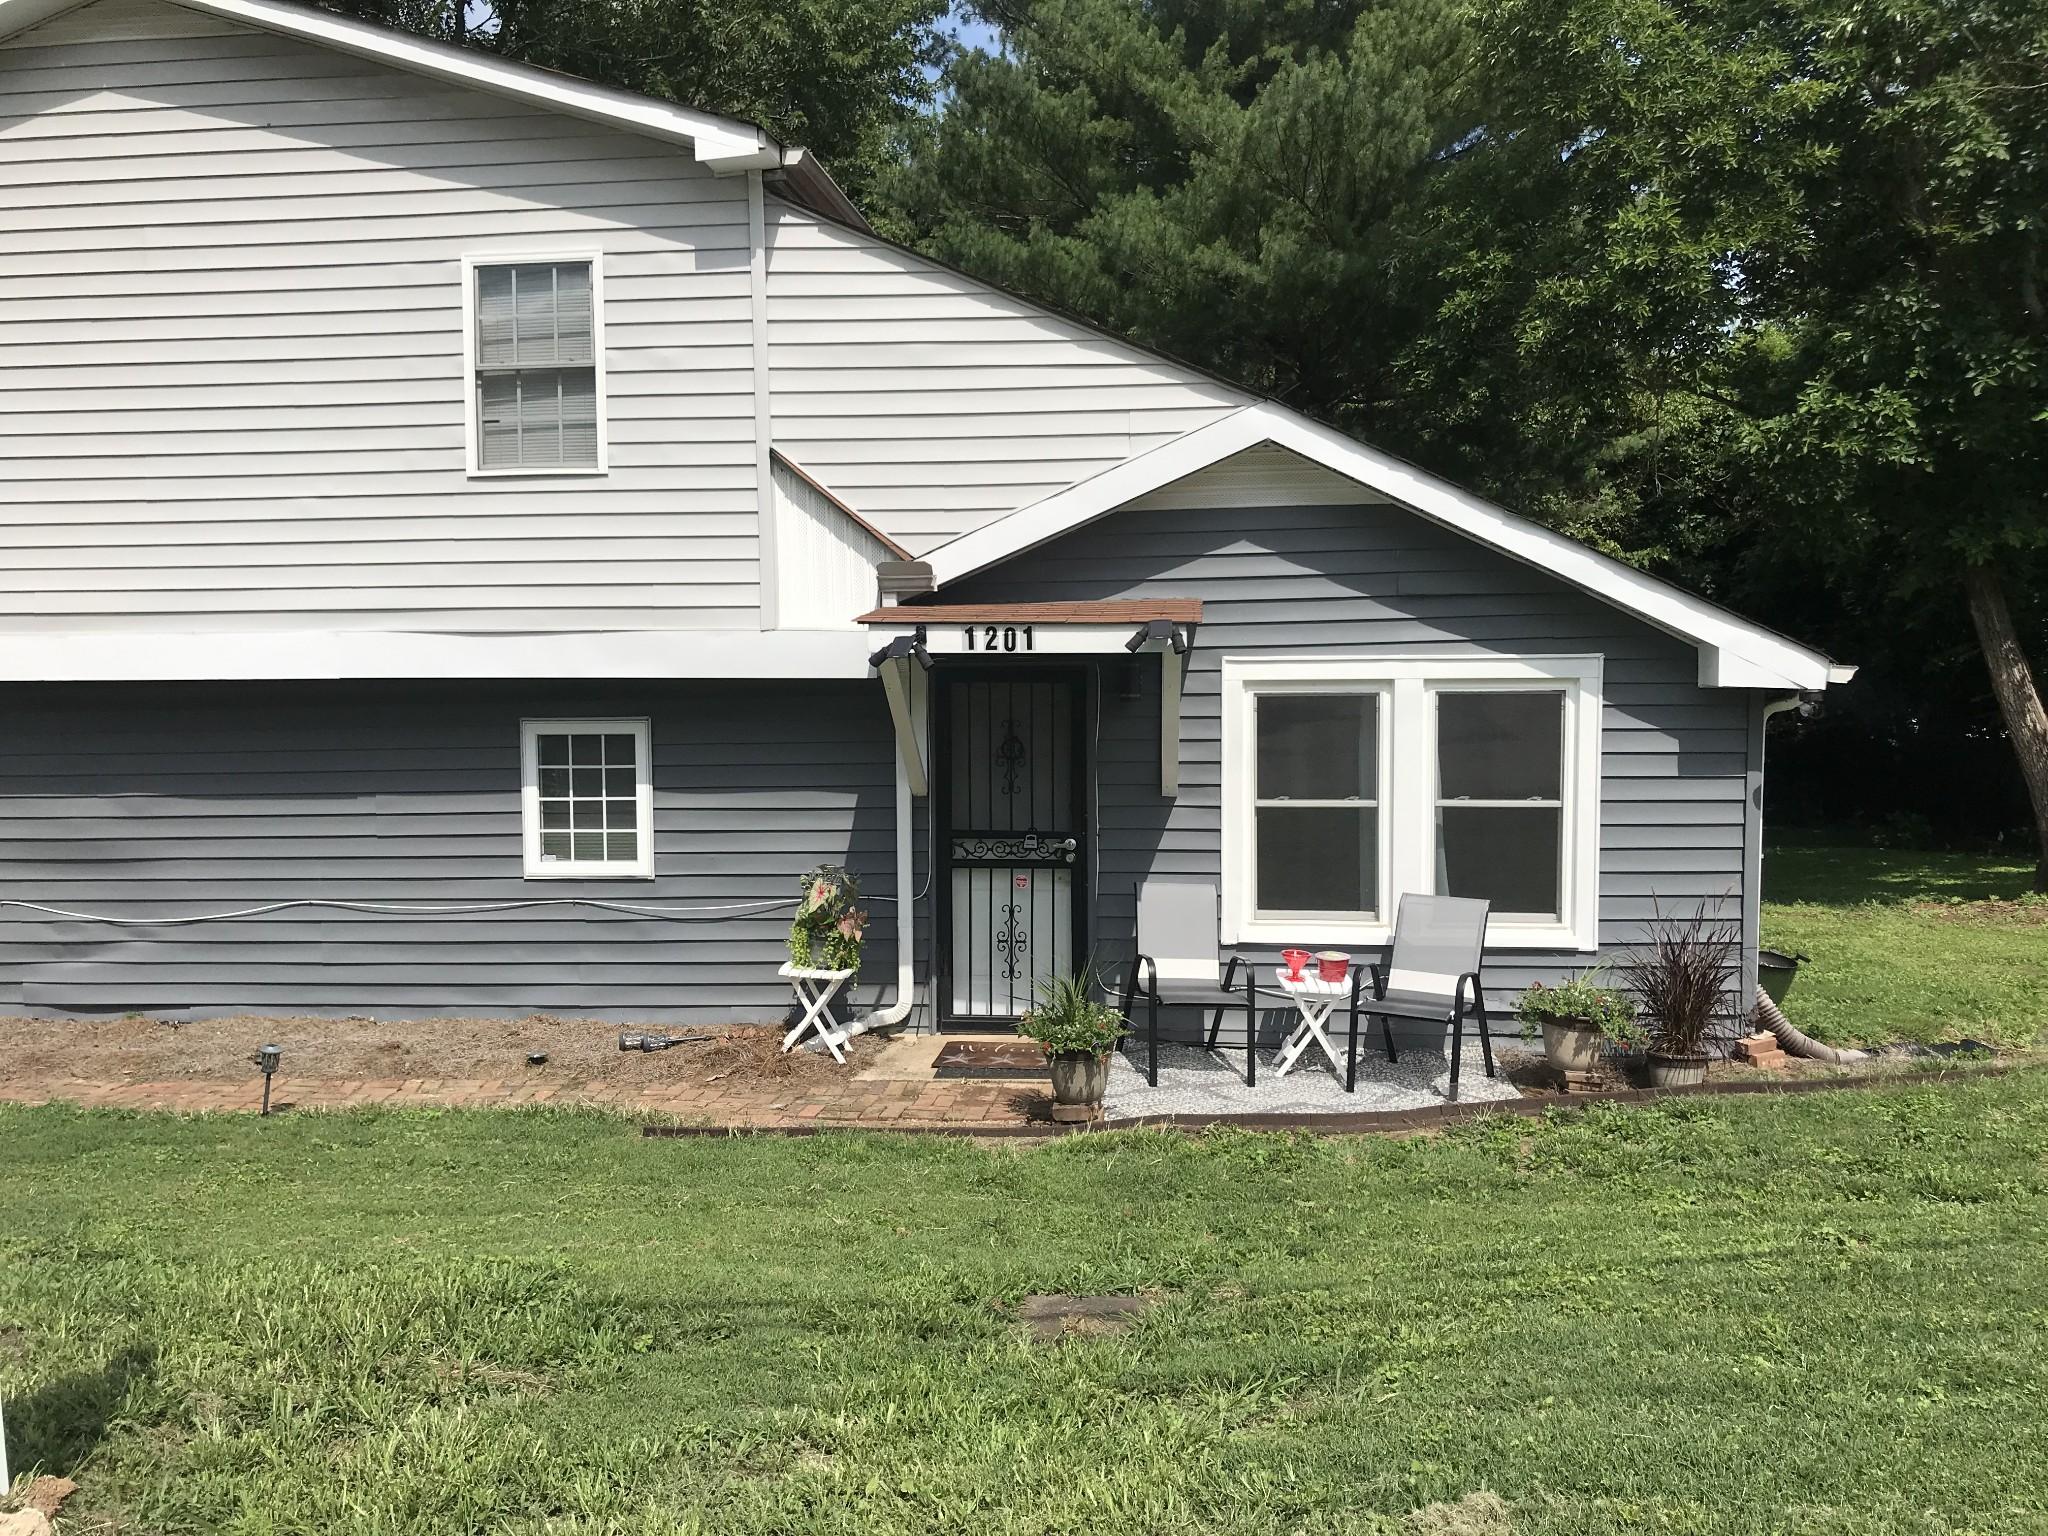 1201 Roberta St, Nashville, TN 37206 - Nashville, TN real estate listing